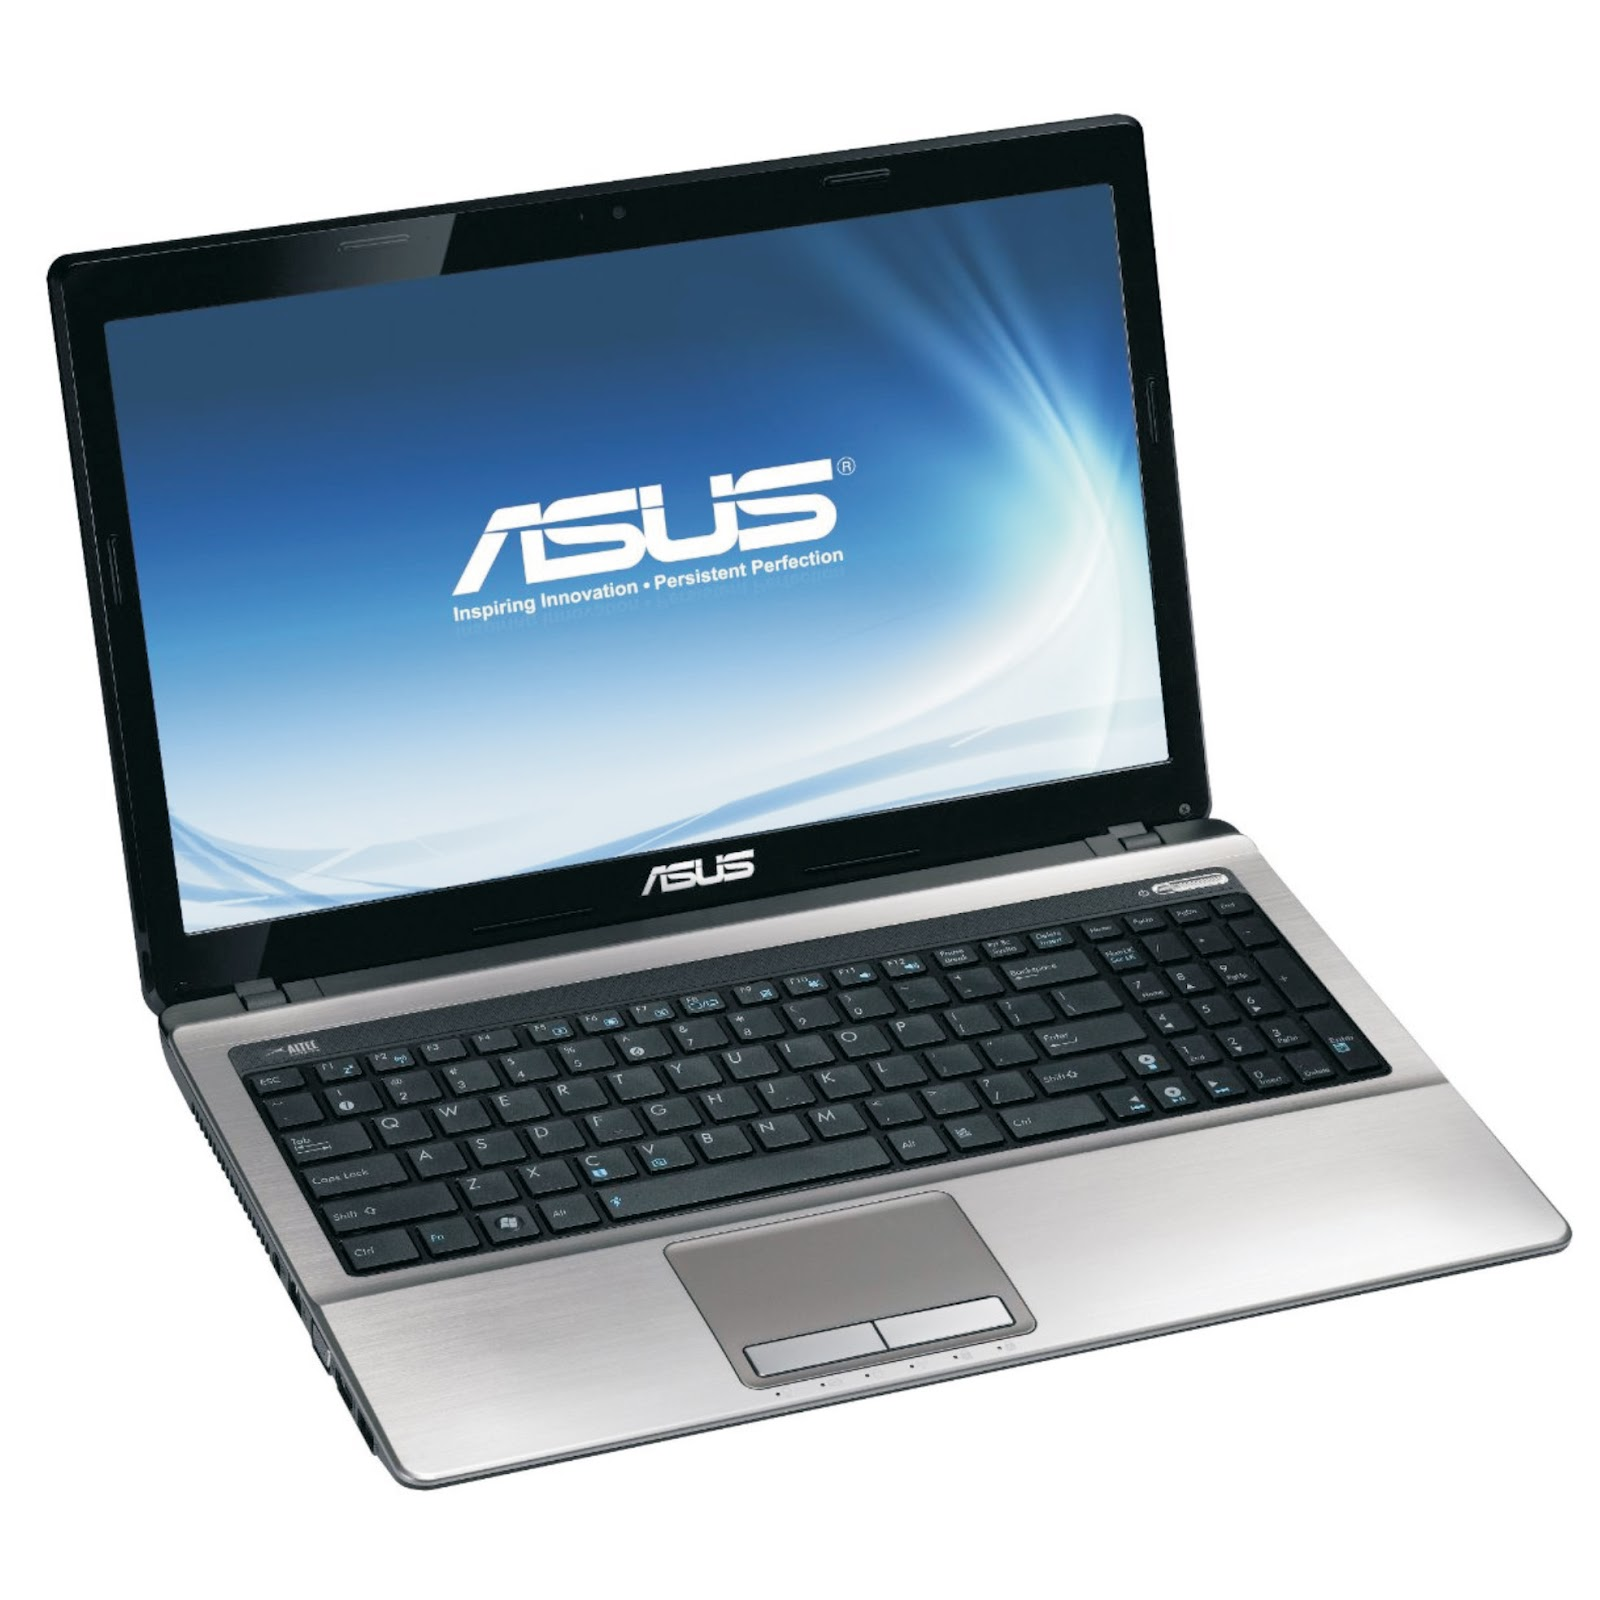 New ASUS A53E-ES31 15.6-Inch Laptop Computer (Black